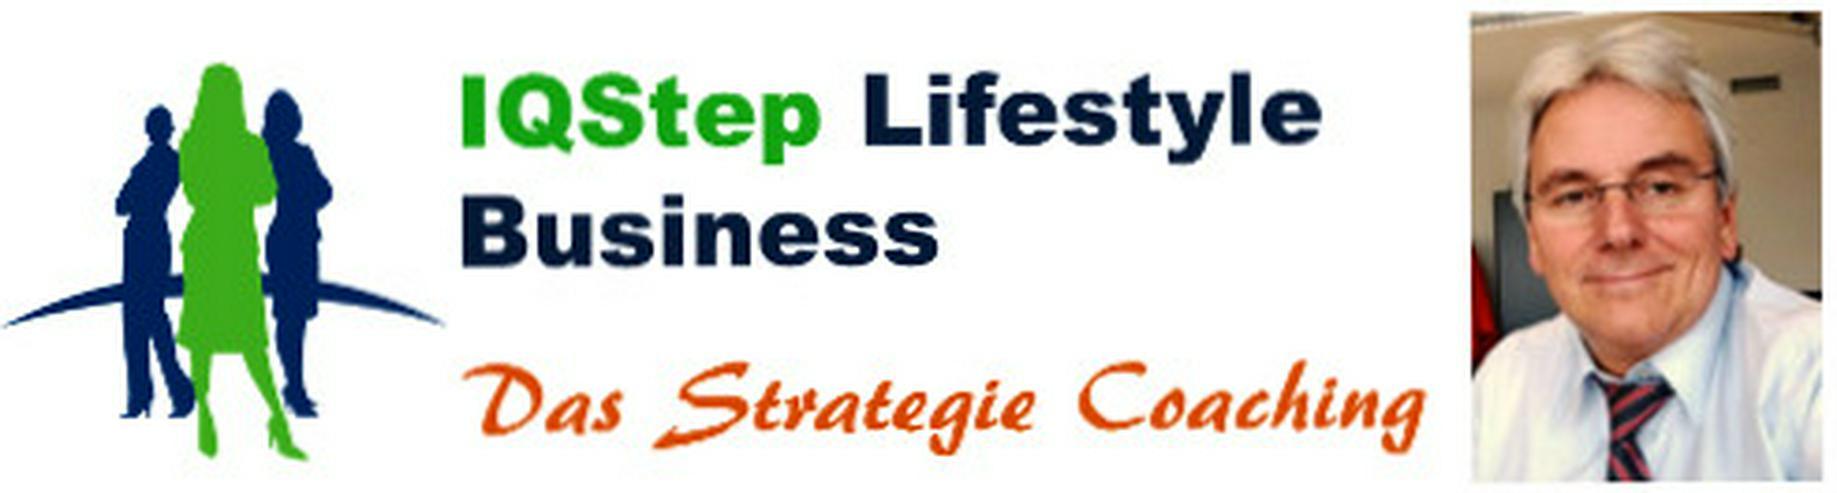 Marketing Online Kurs